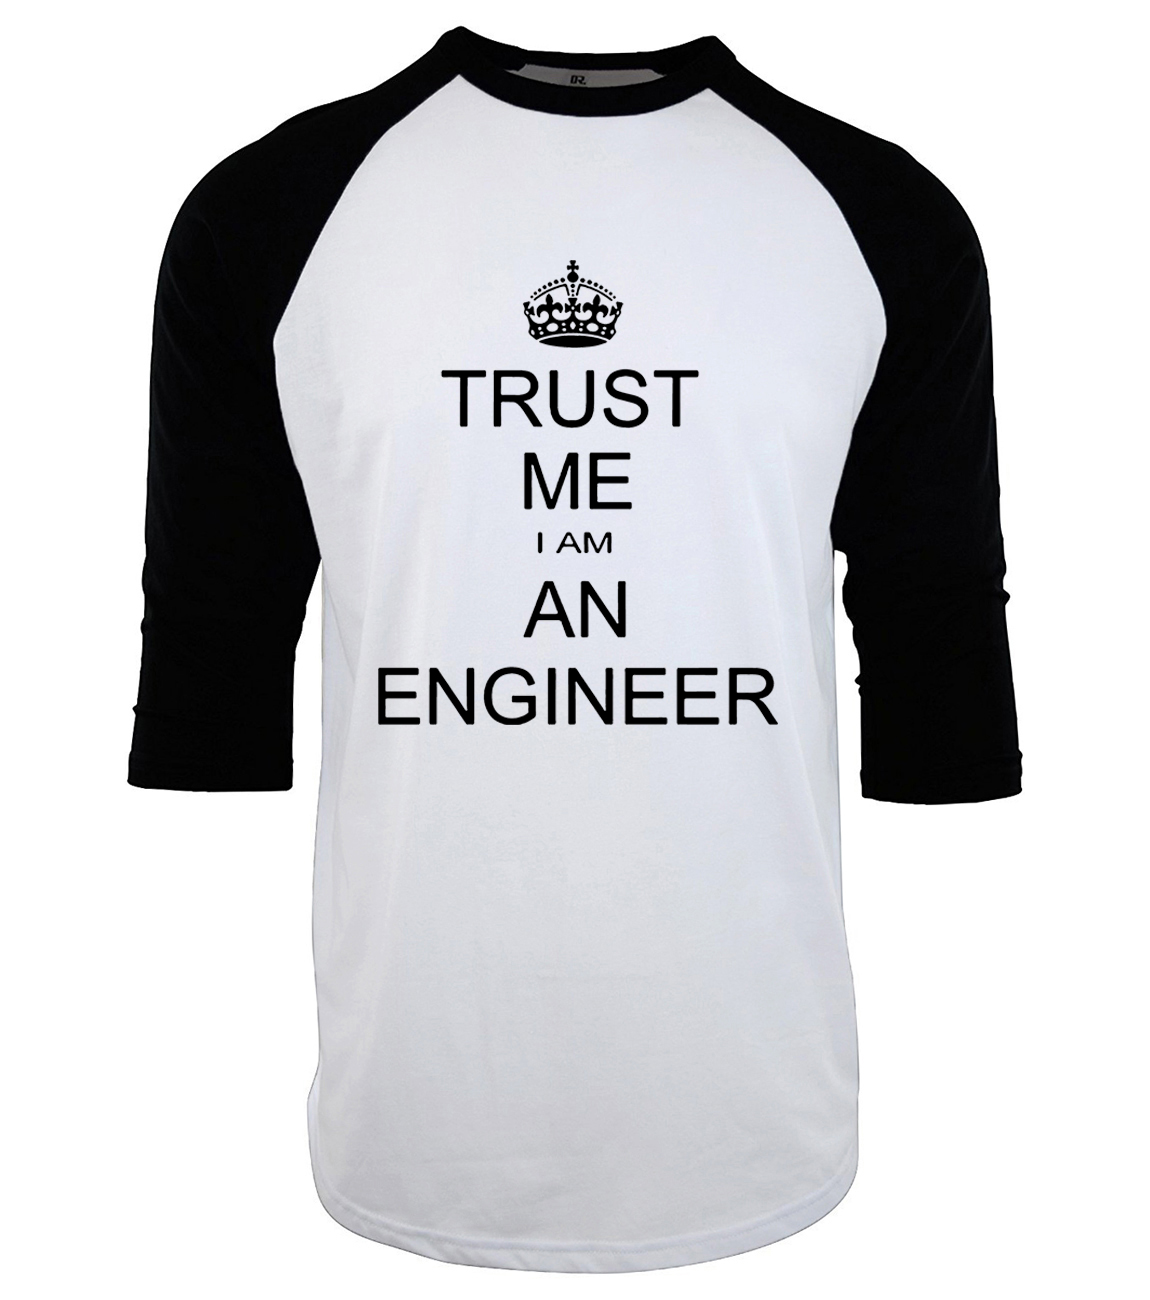 harajuku I Am An Engineer raglan sleeves t-shirt homme man's T-shirt three-quarter sleeve mens t shirt fashion 2019 Camiseta mma